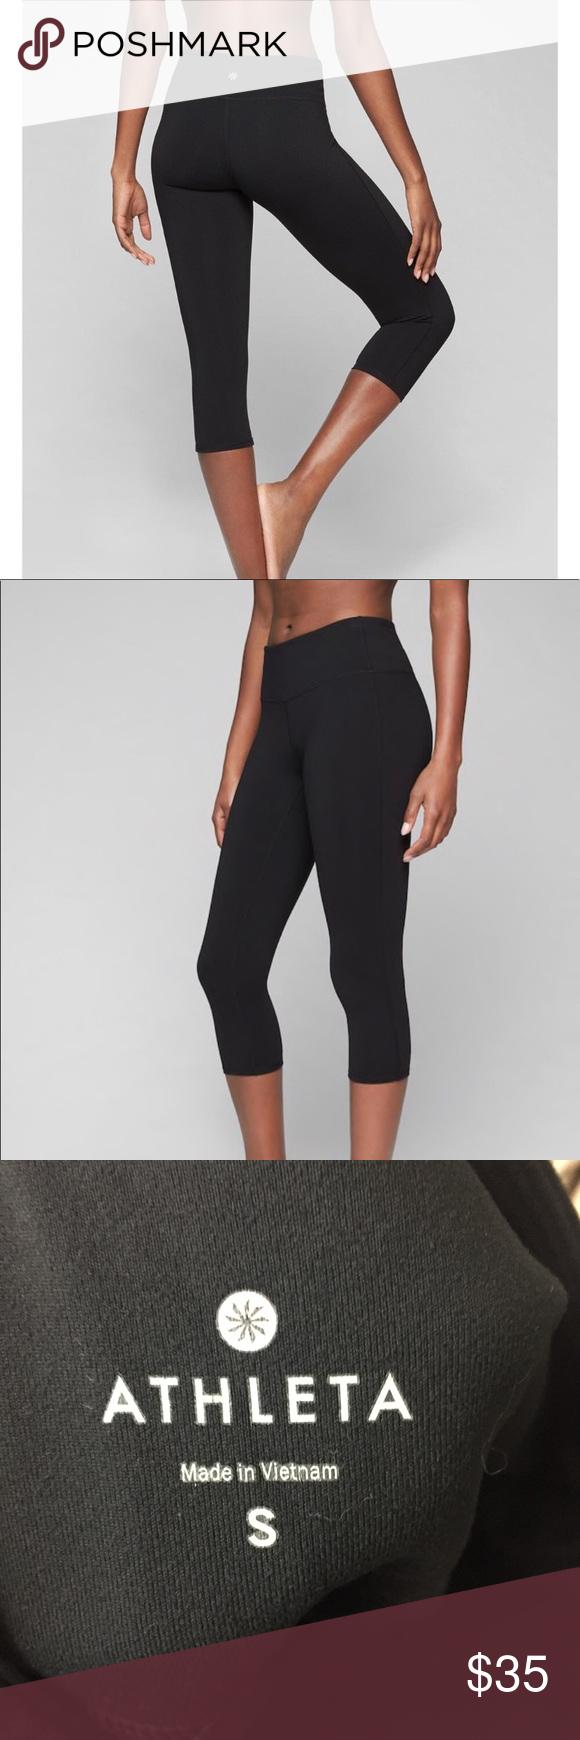 Athleta Leggings Black Workout Capri Small Athleta Leggings Workout Capris Black Leggings